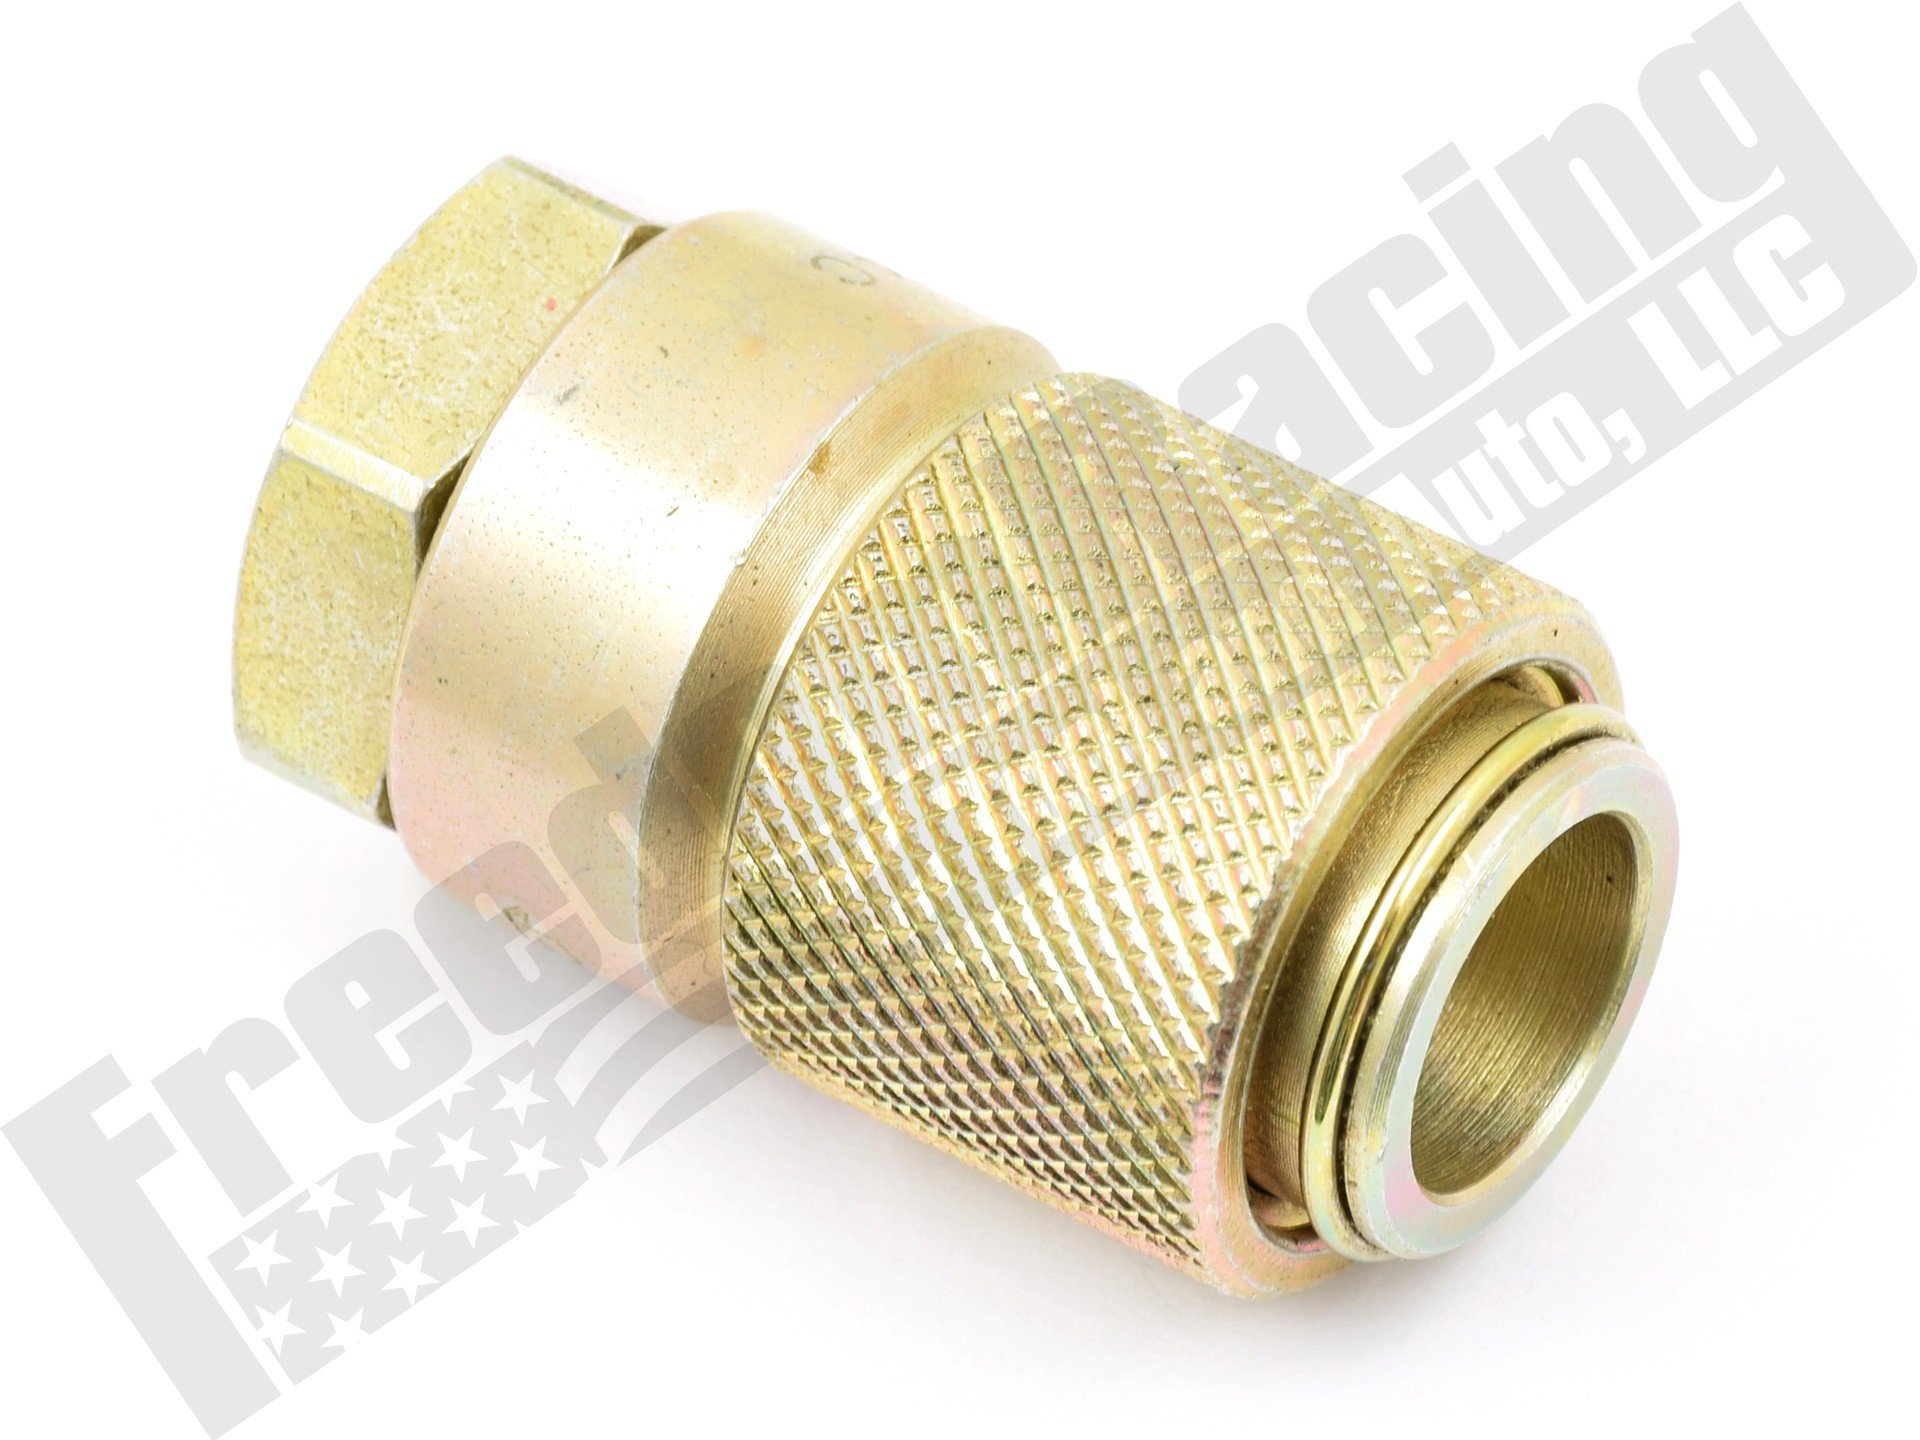 Ford OTC Rotunda 310-145 4.5L Diesel Oil Pressure Leak Test Adapter Tool